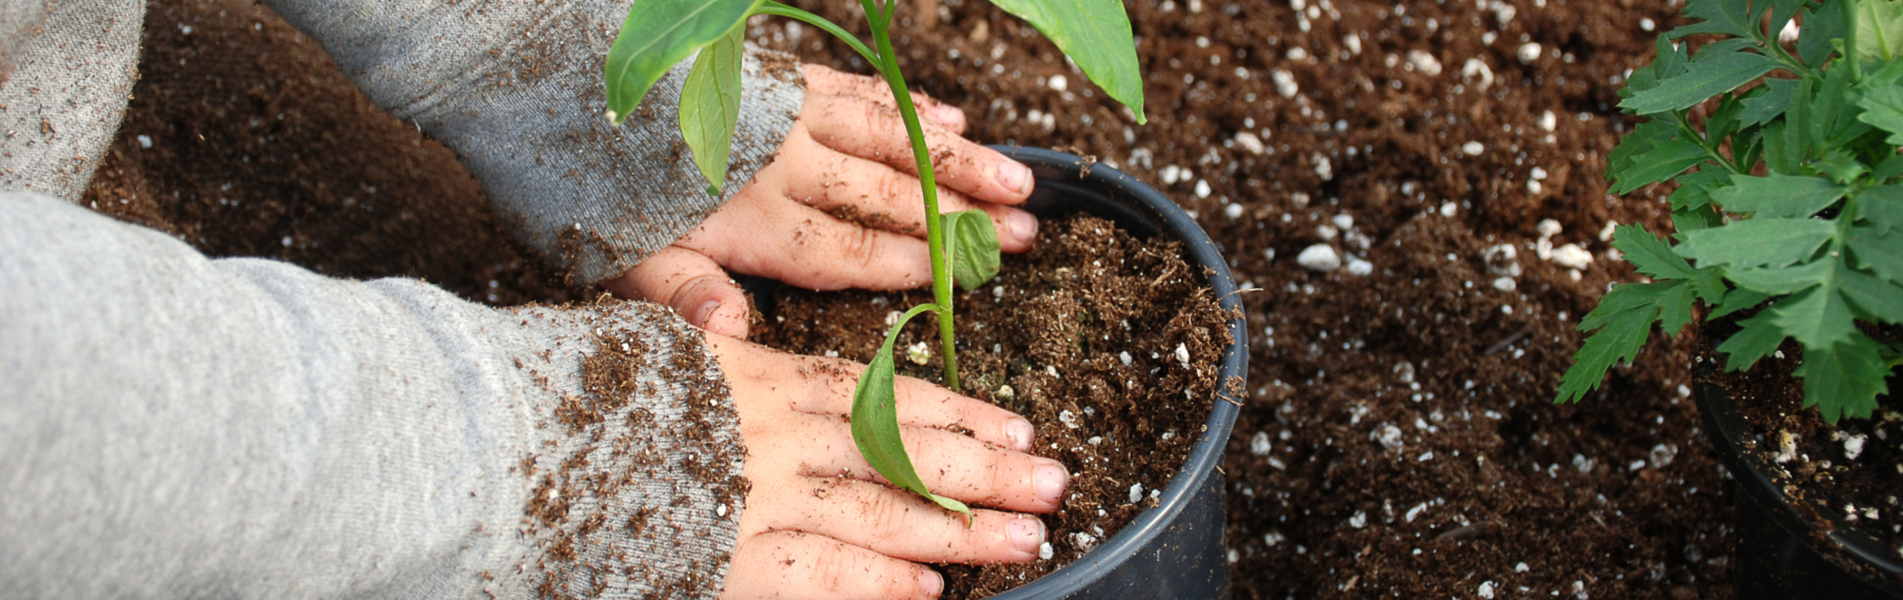 Plastic Plant Pots, Jiffy Pellets and Plant Pots, Greenhouse Glazing Clips